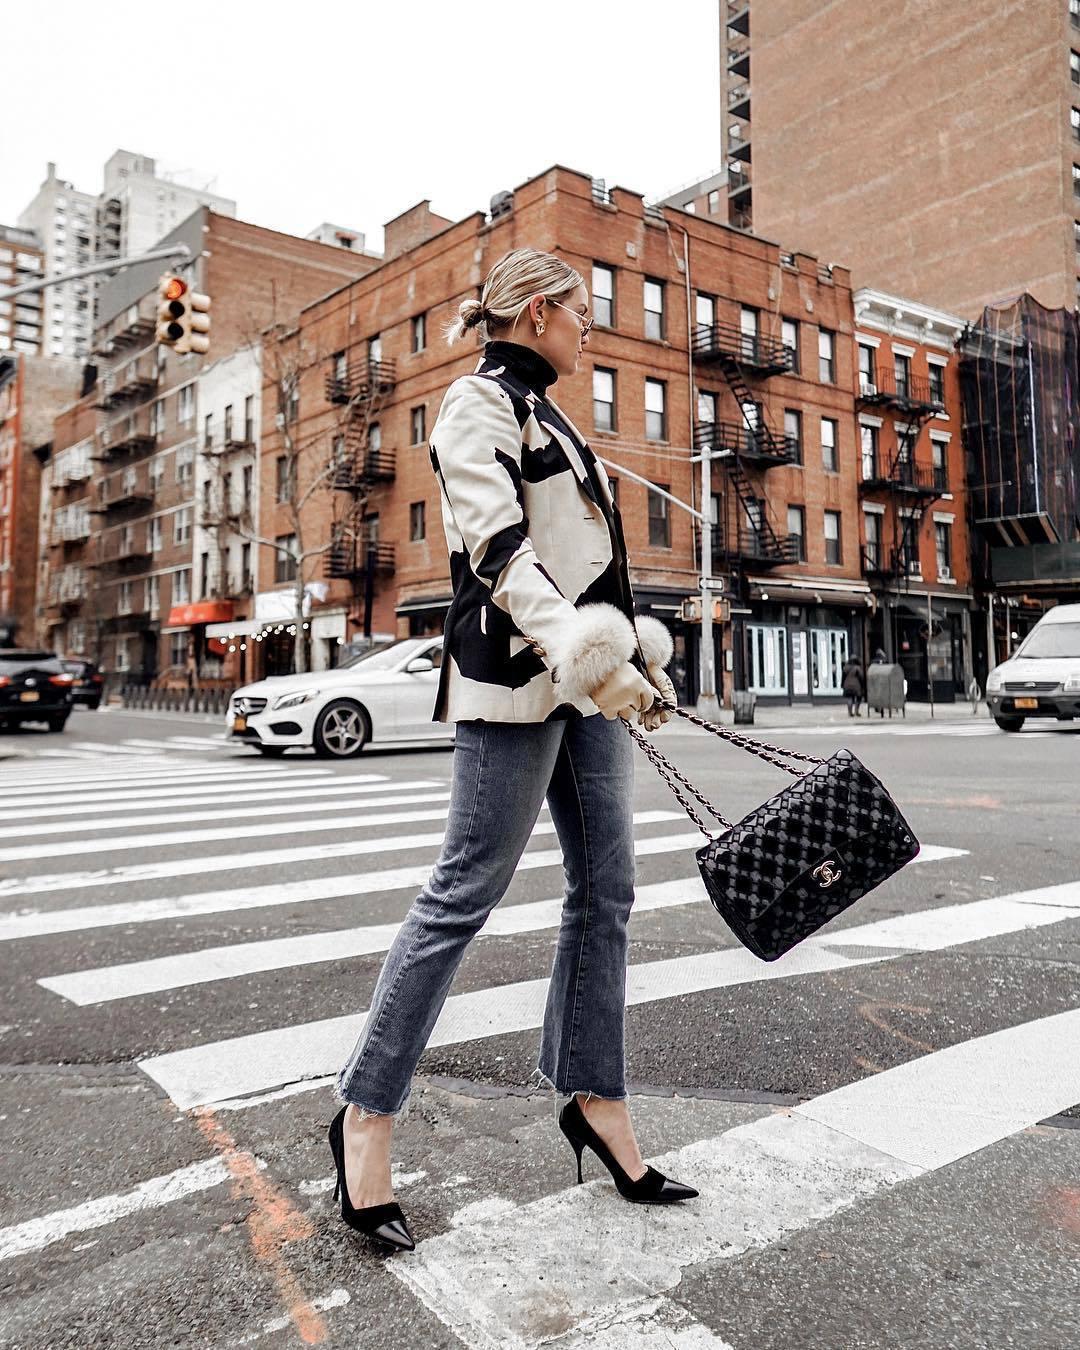 bag chanel bag black bag patent bag pumps cropped jeans grey jeans straight jeans moschino jacket black turtleneck top